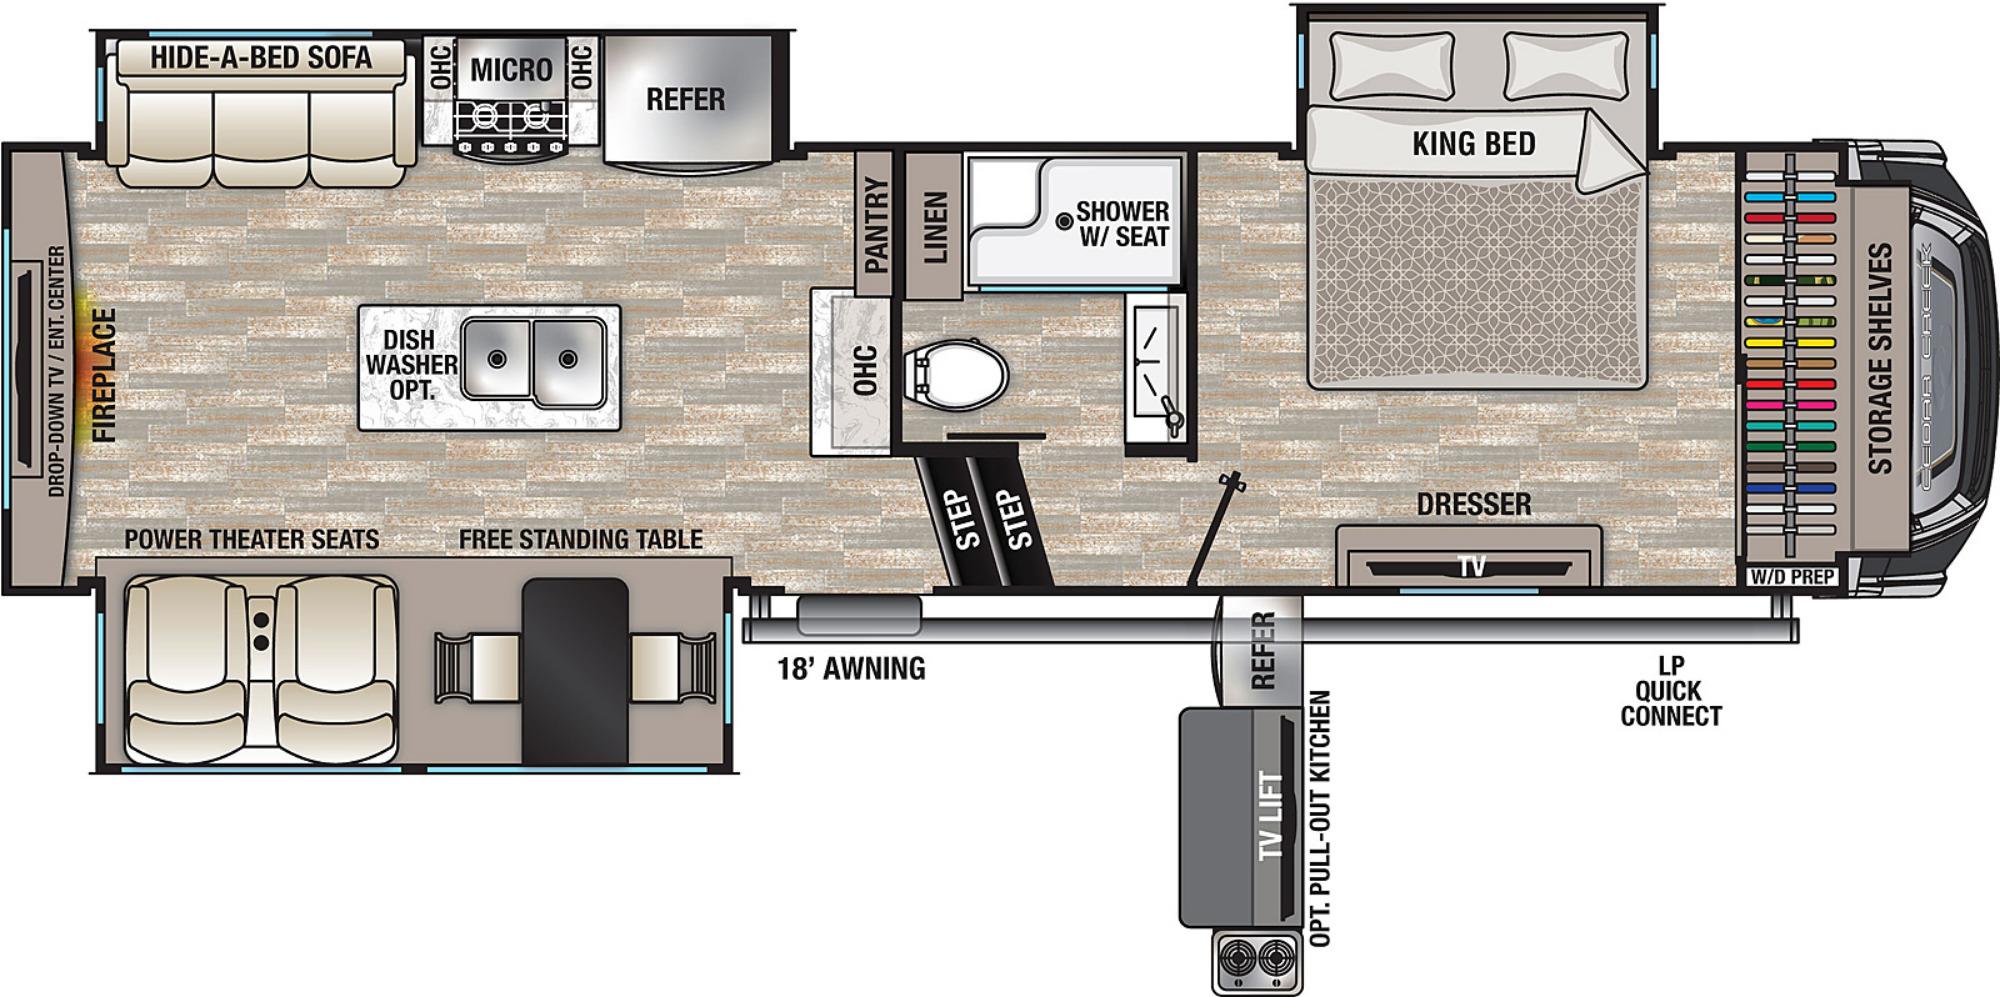 View Floor Plan for 2022 FOREST RIVER CEDAR CREEK 291RW